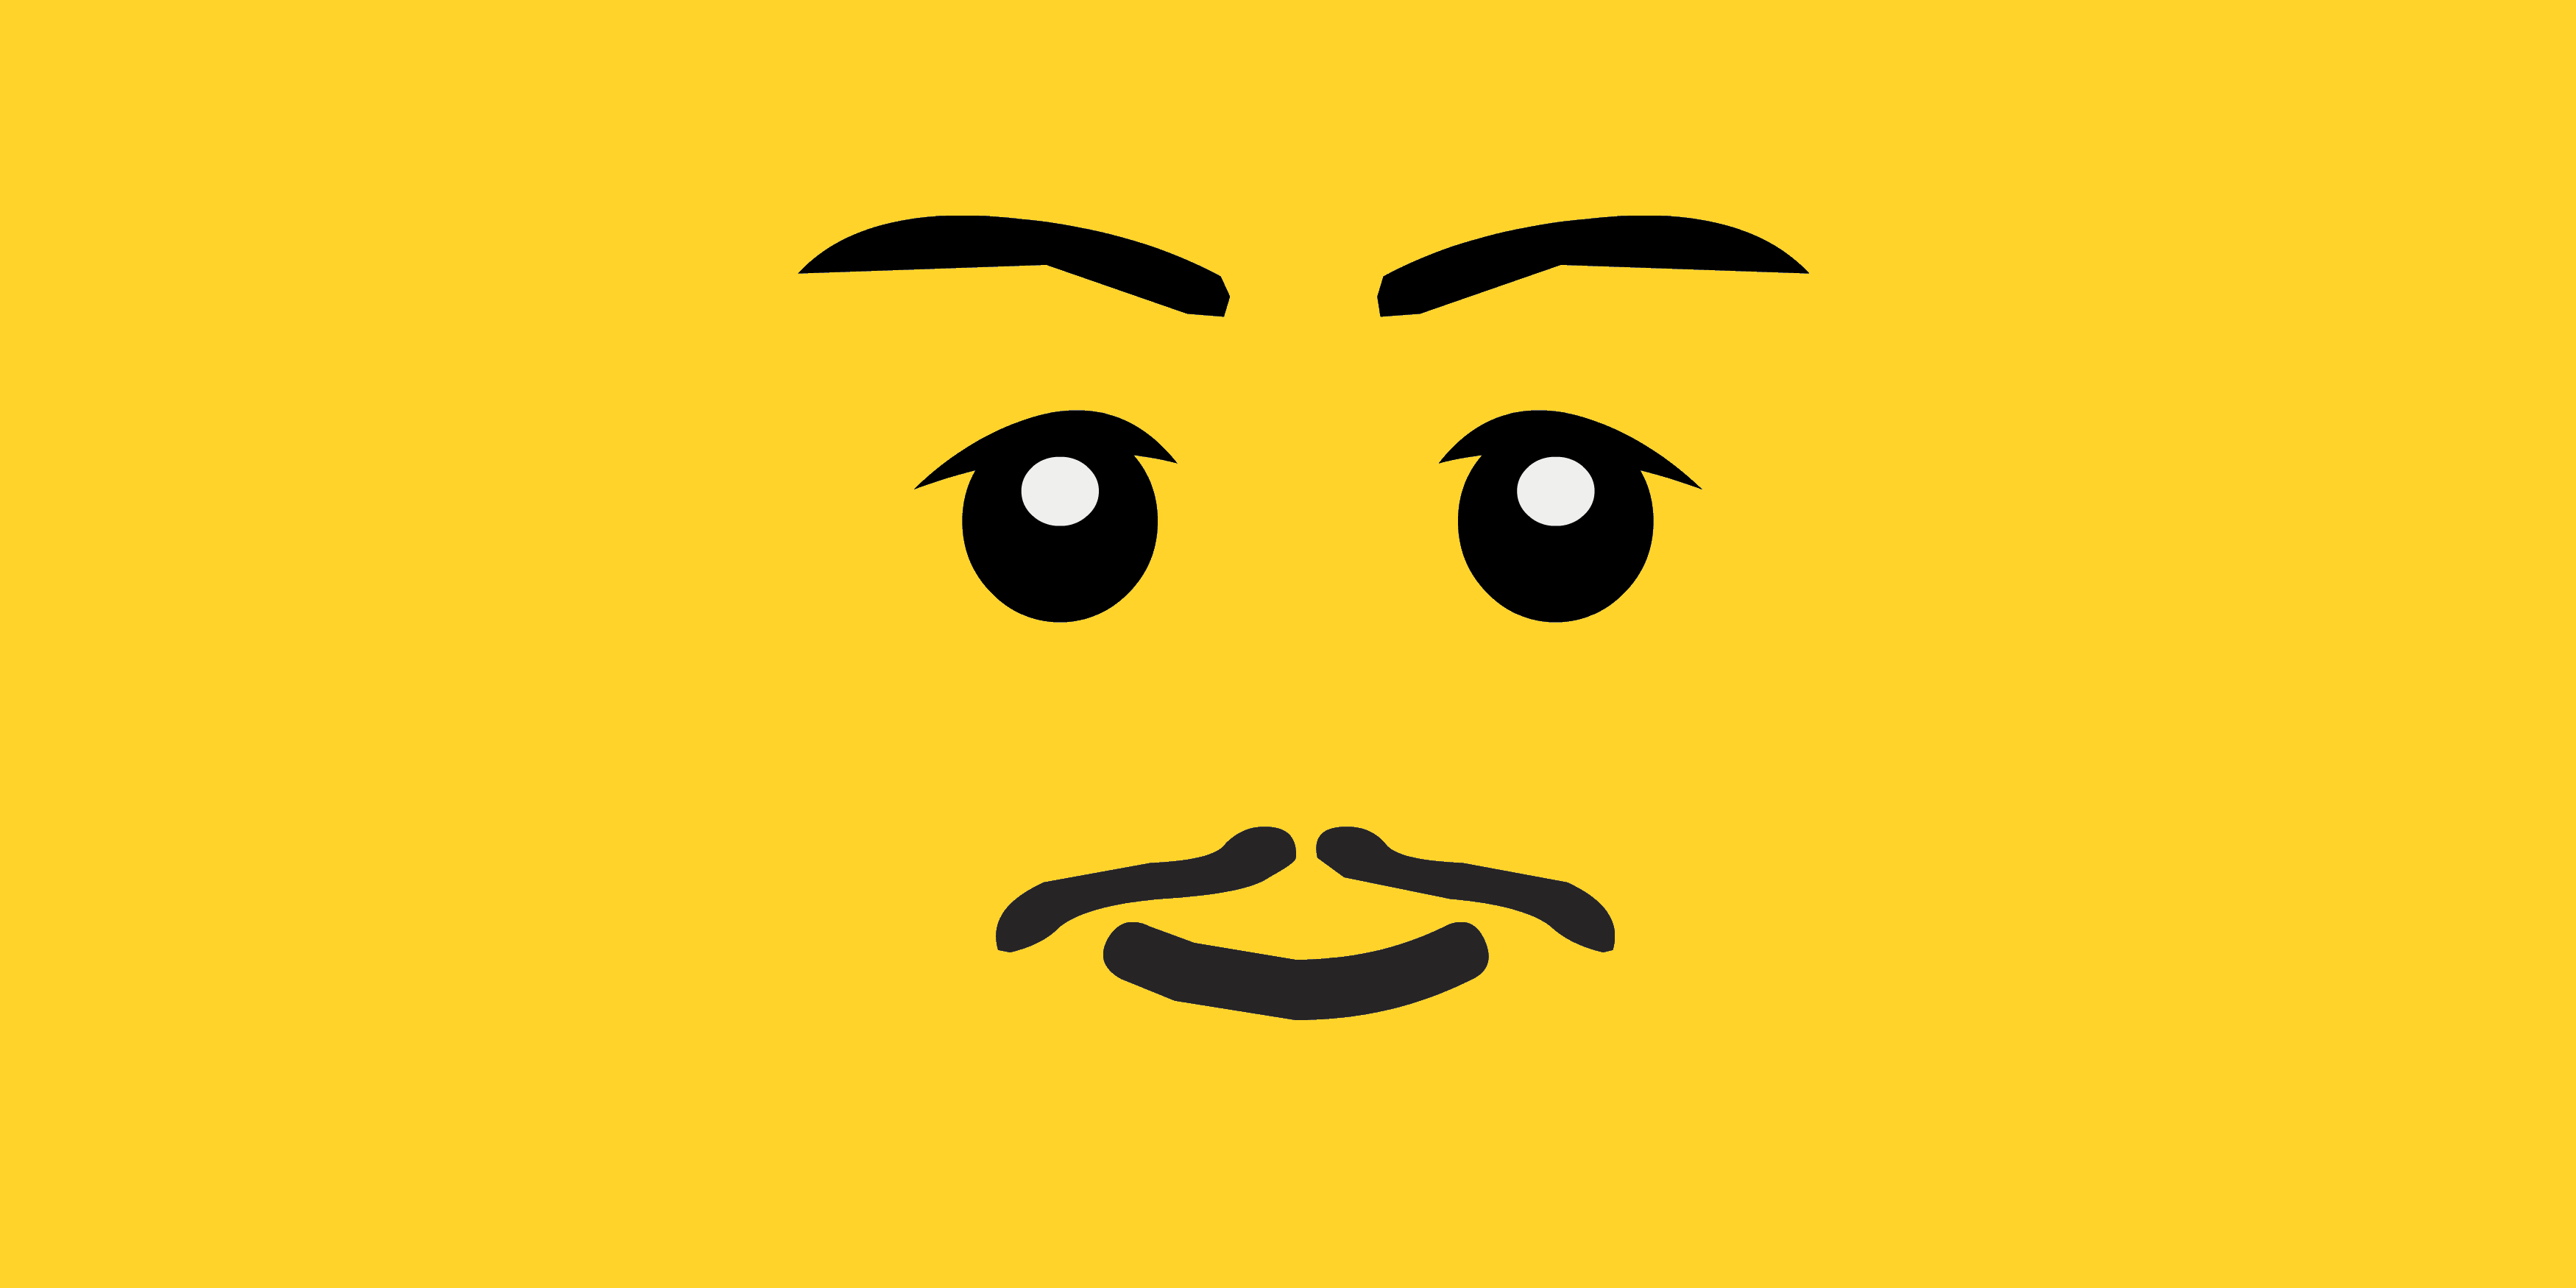 Lego Man Head Template Lego minifigur.